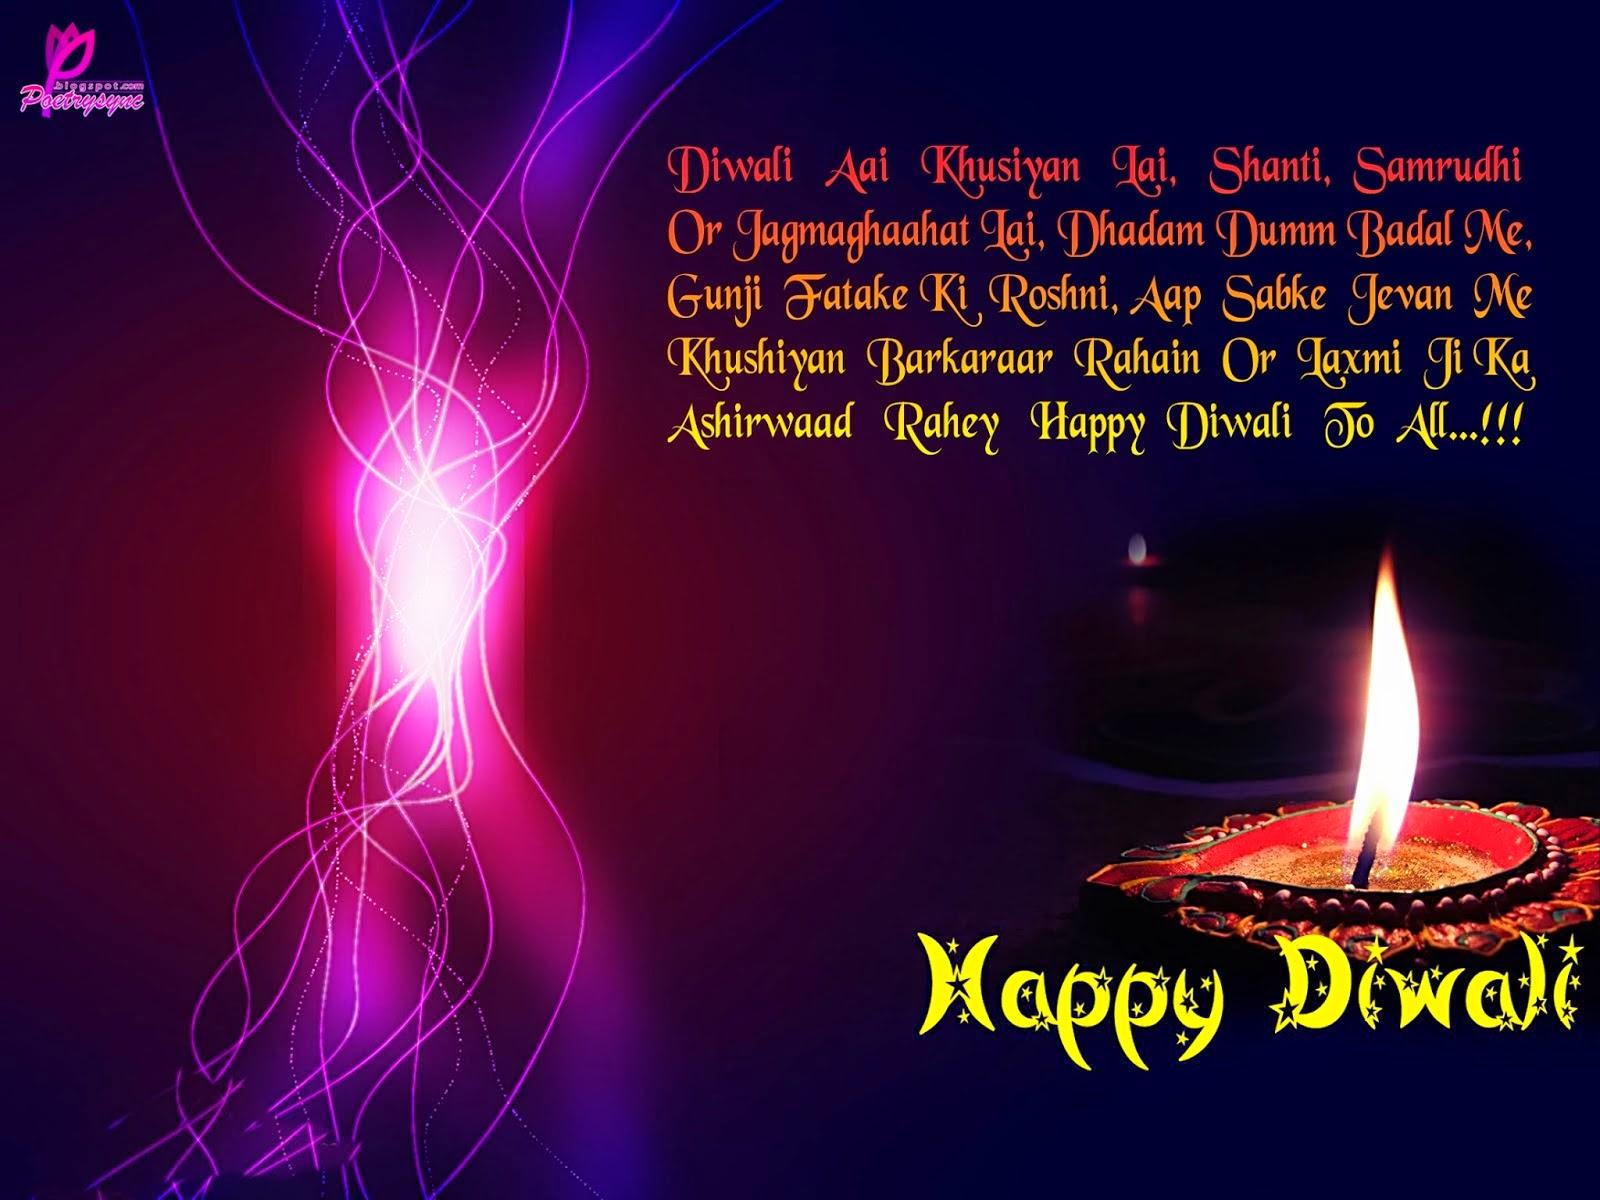 Shubh Deepavli SMS